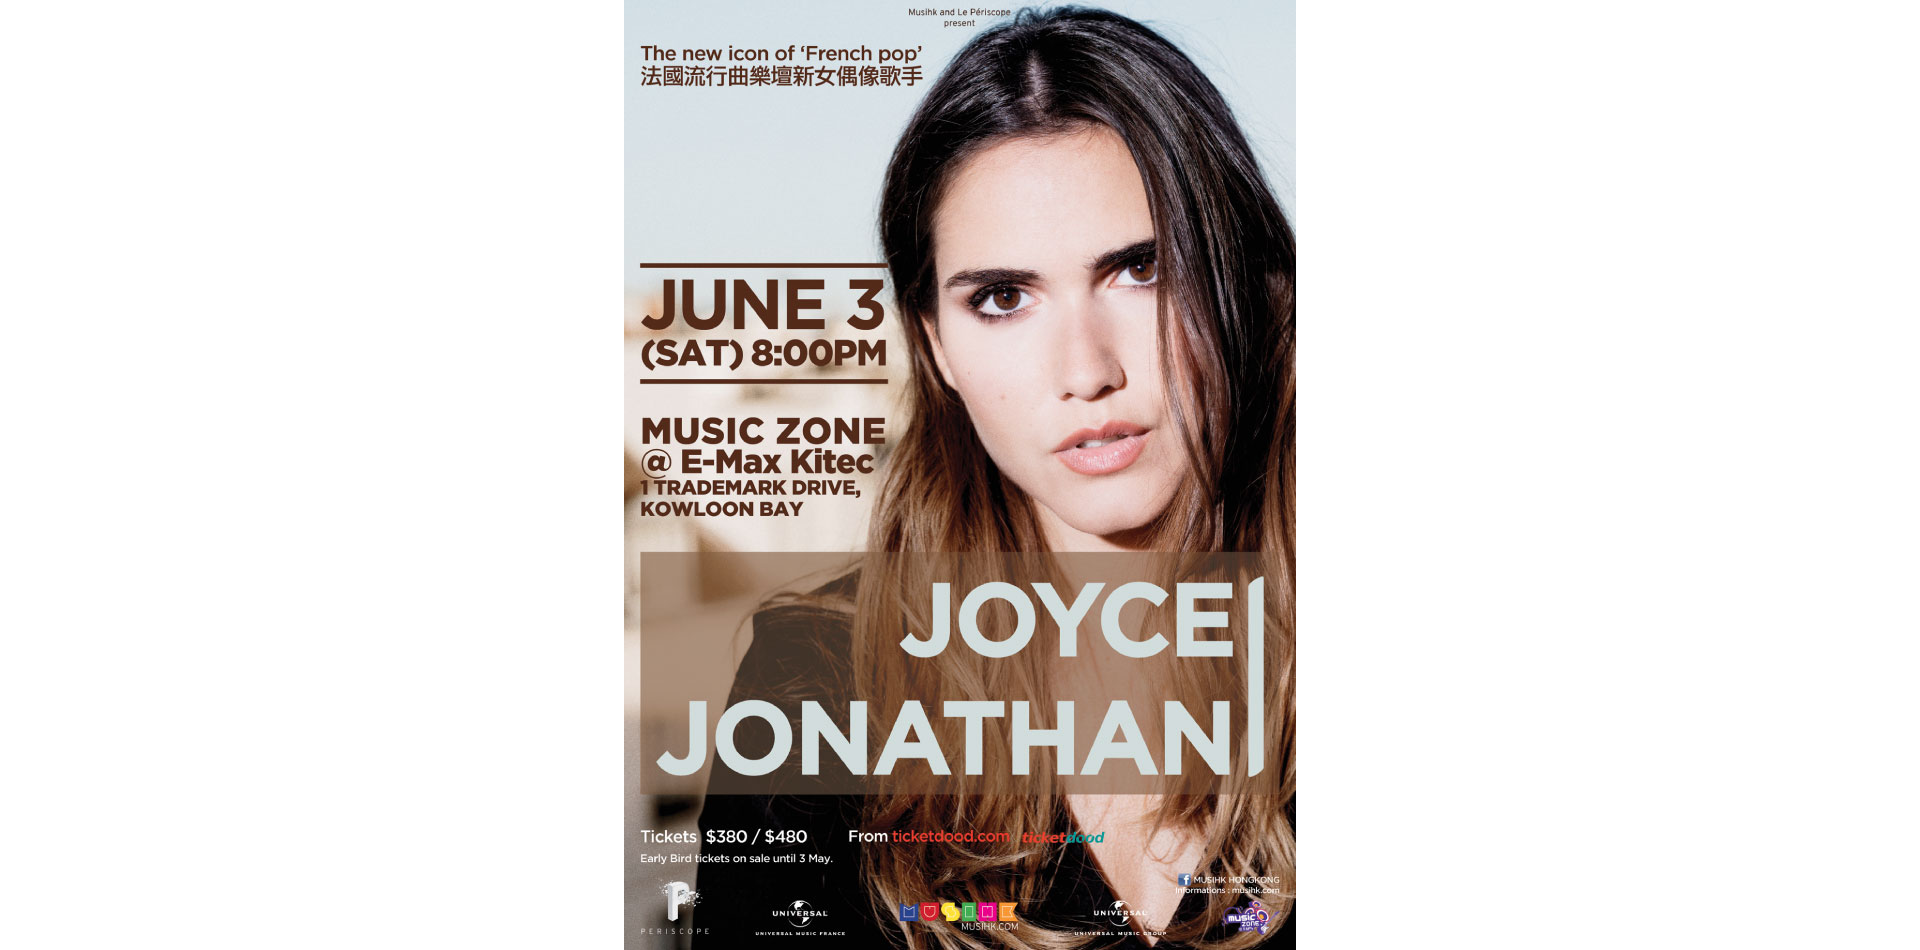 Joyce Jonathan - Asian Tour 2017